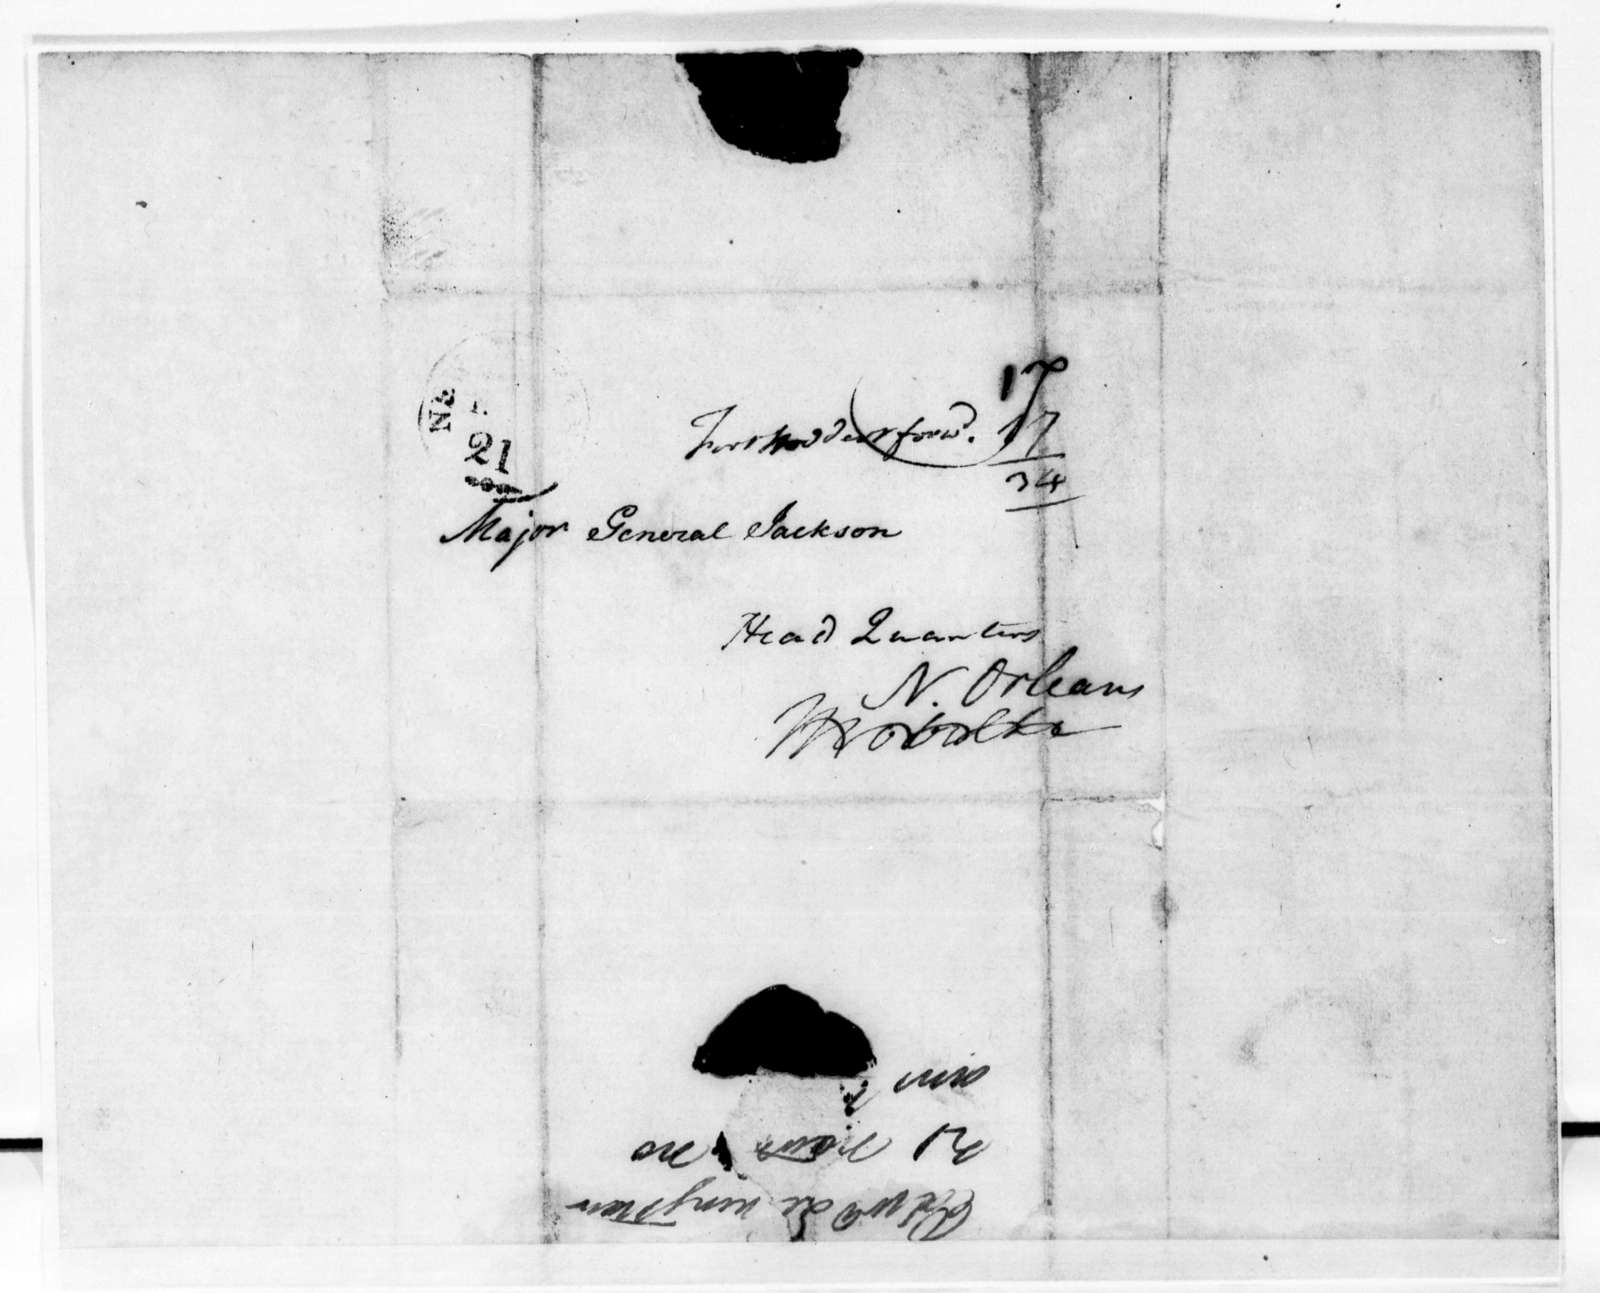 Edward Livingston to Andrew Jackson, November 21, 1814